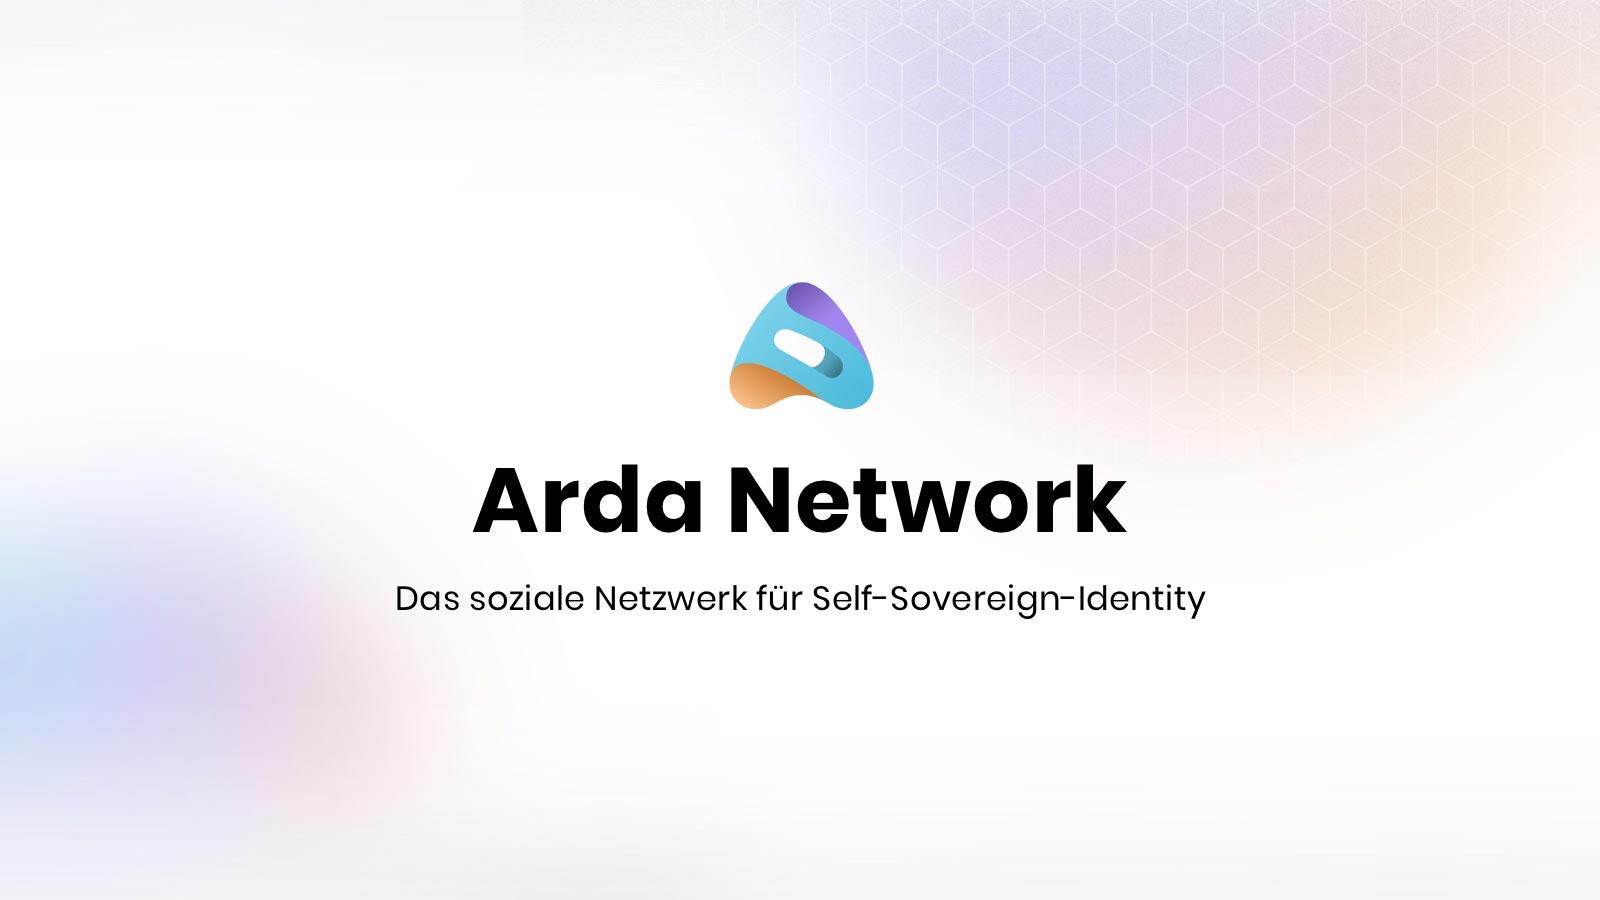 Arda Network